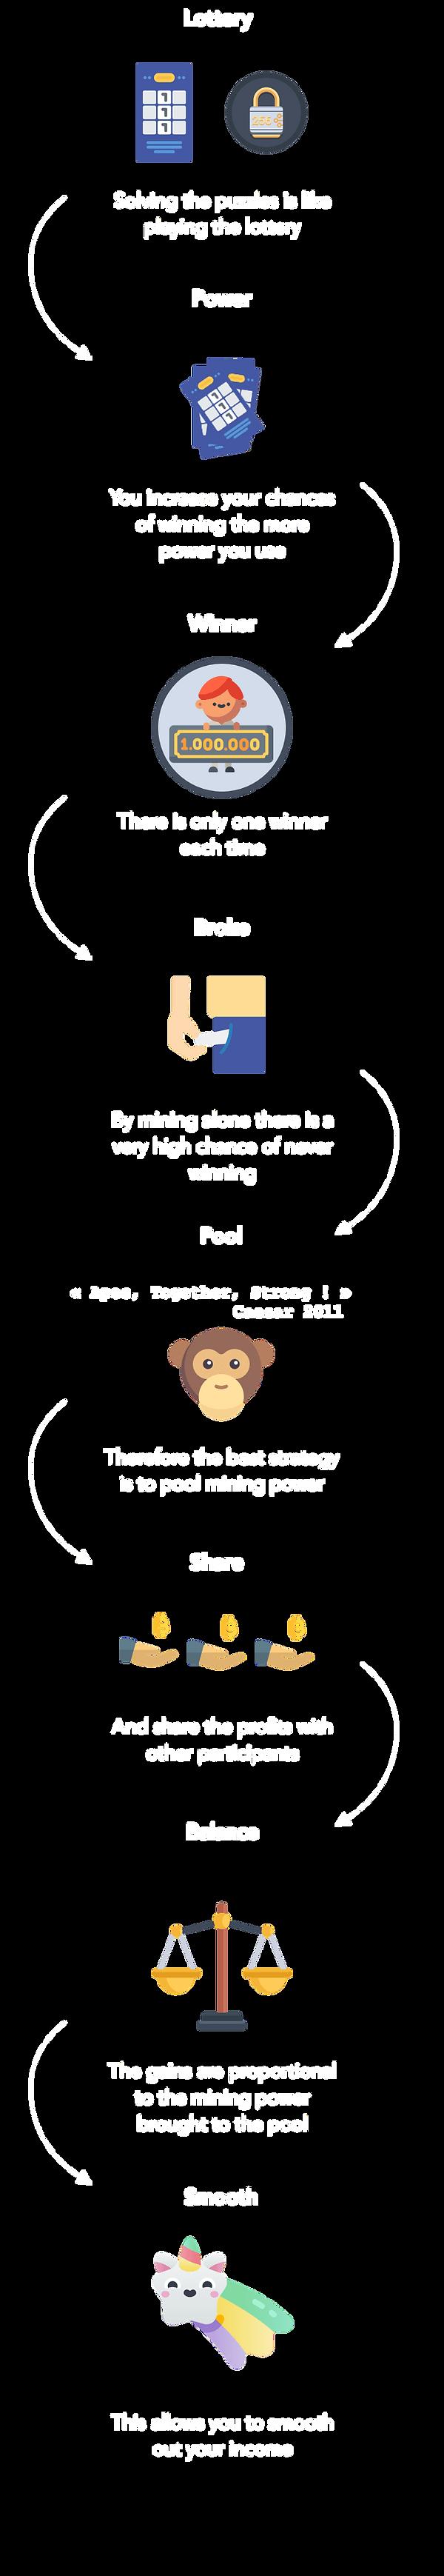 EN-Mobile-miningpool.png